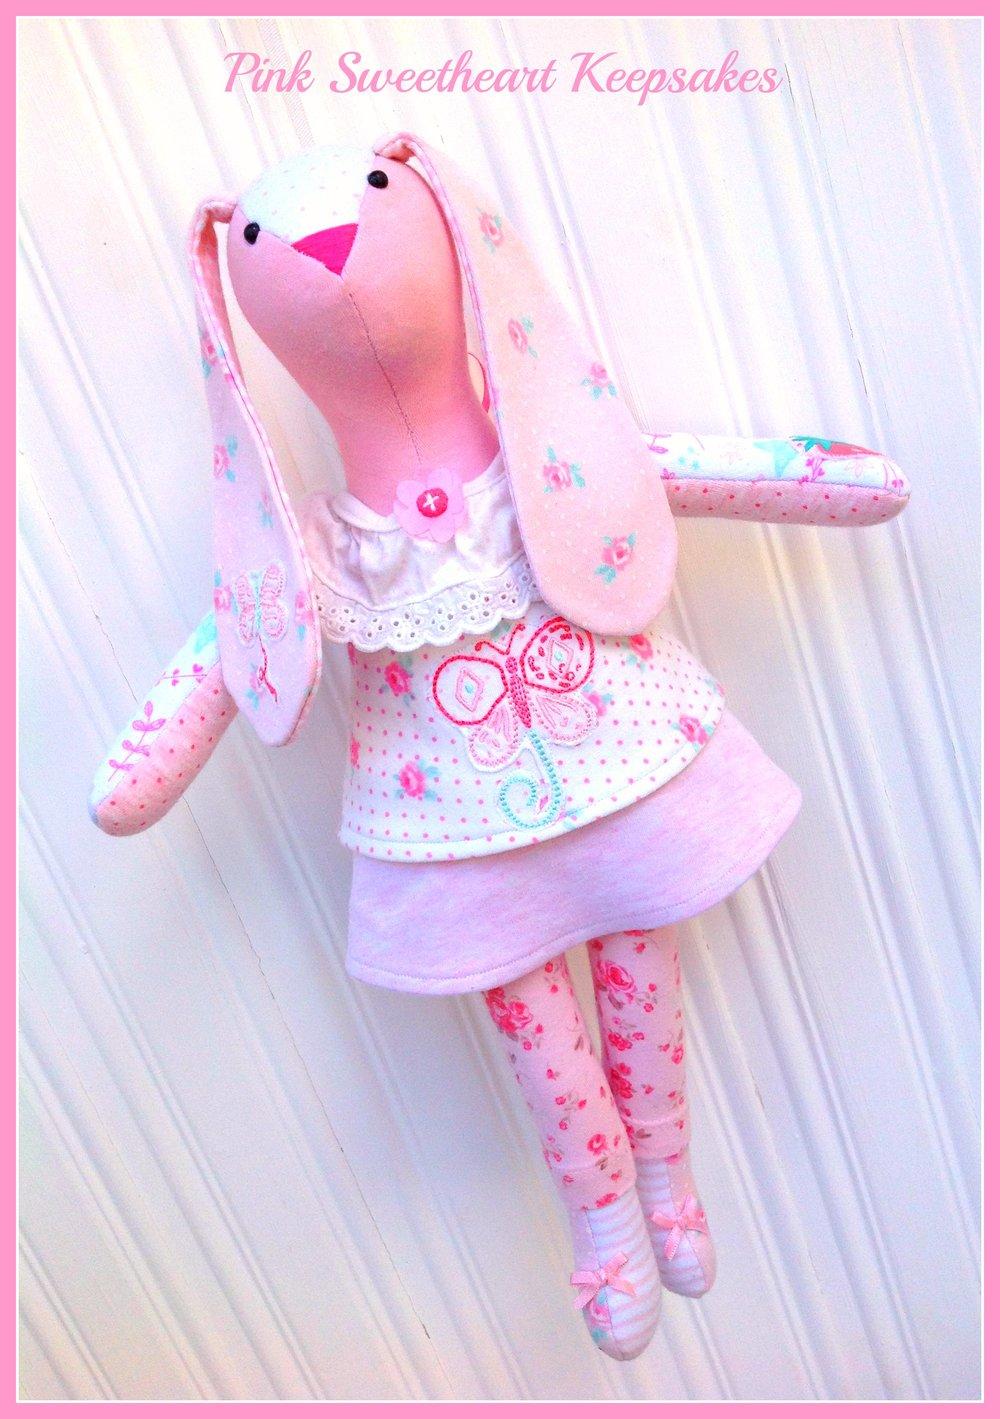 Arla's Bunny